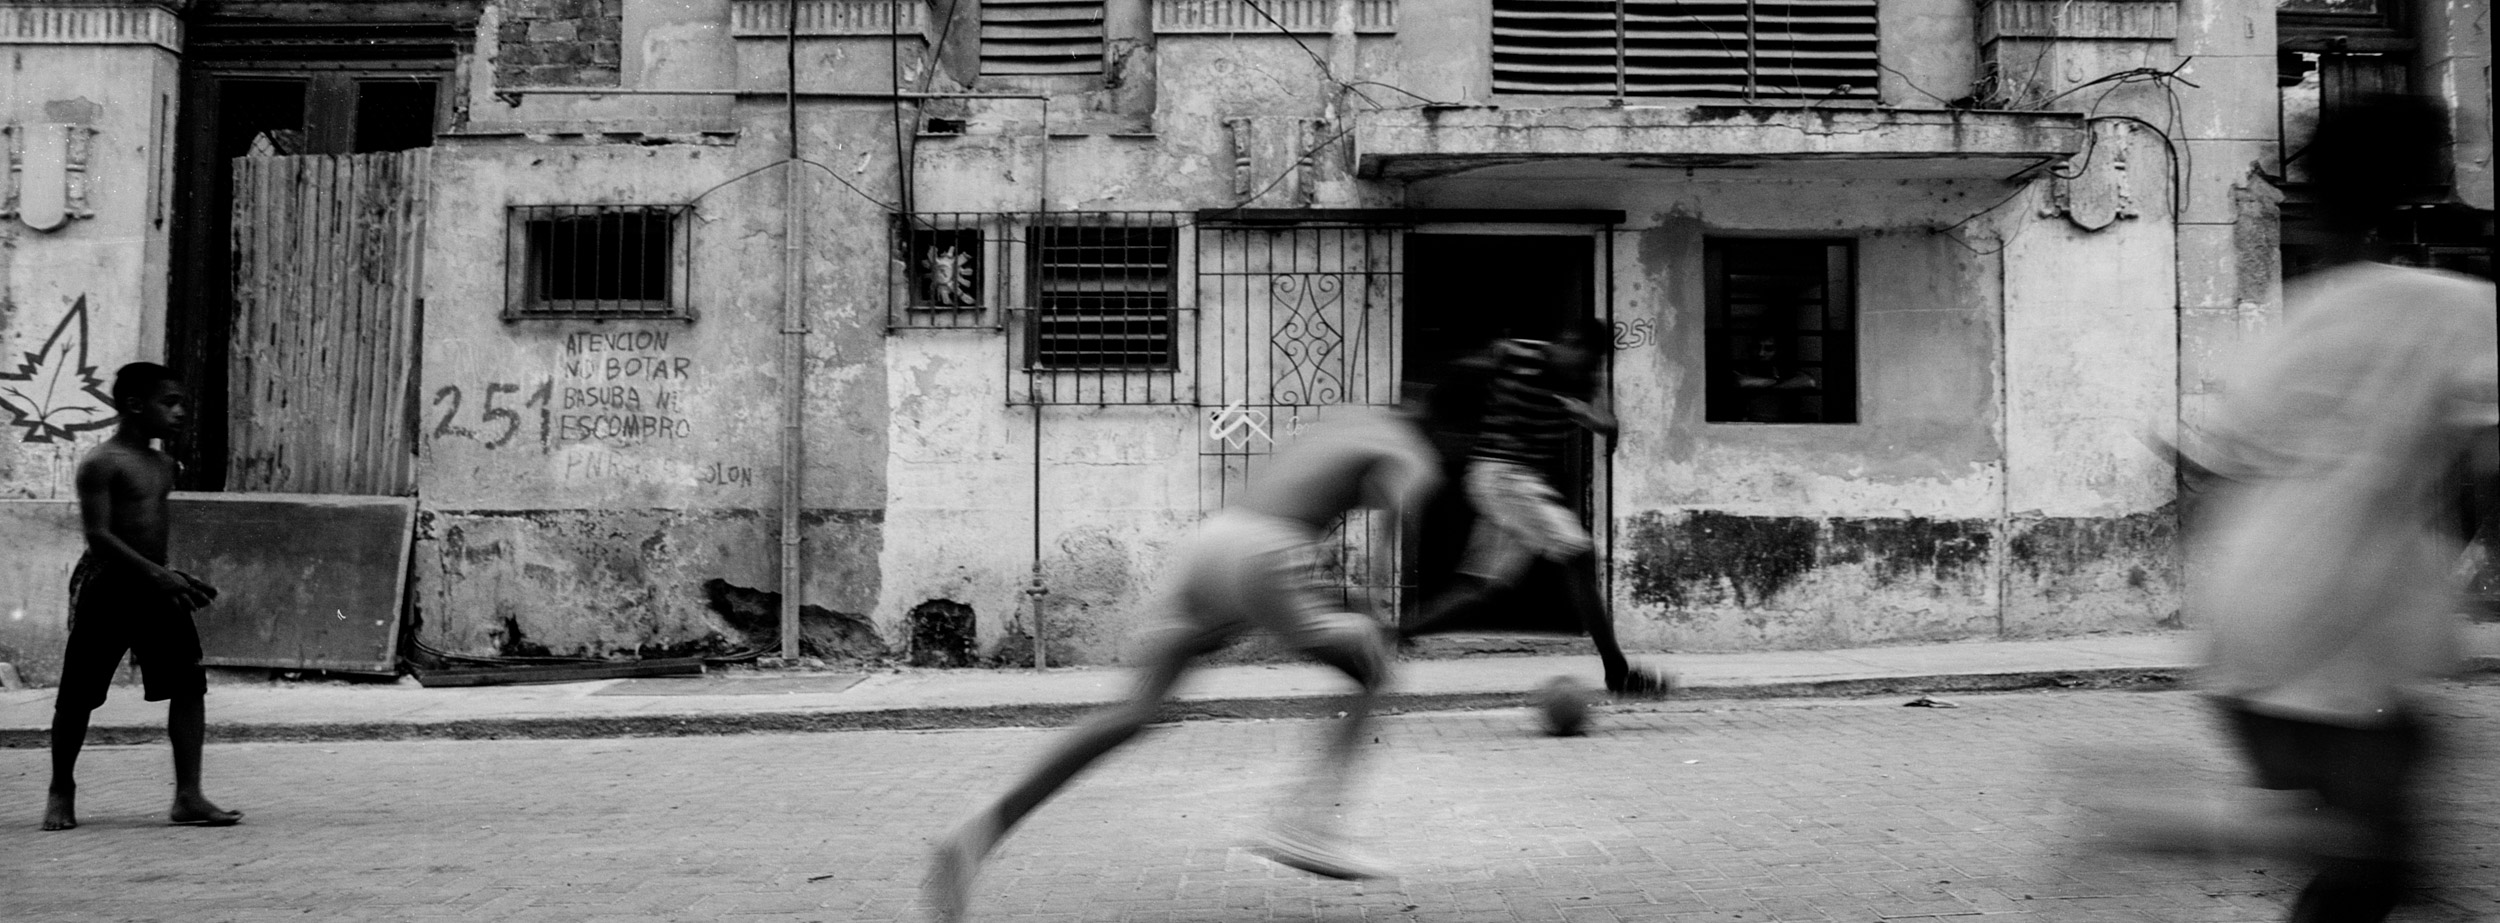 JackMcKain_Havana-376.jpg